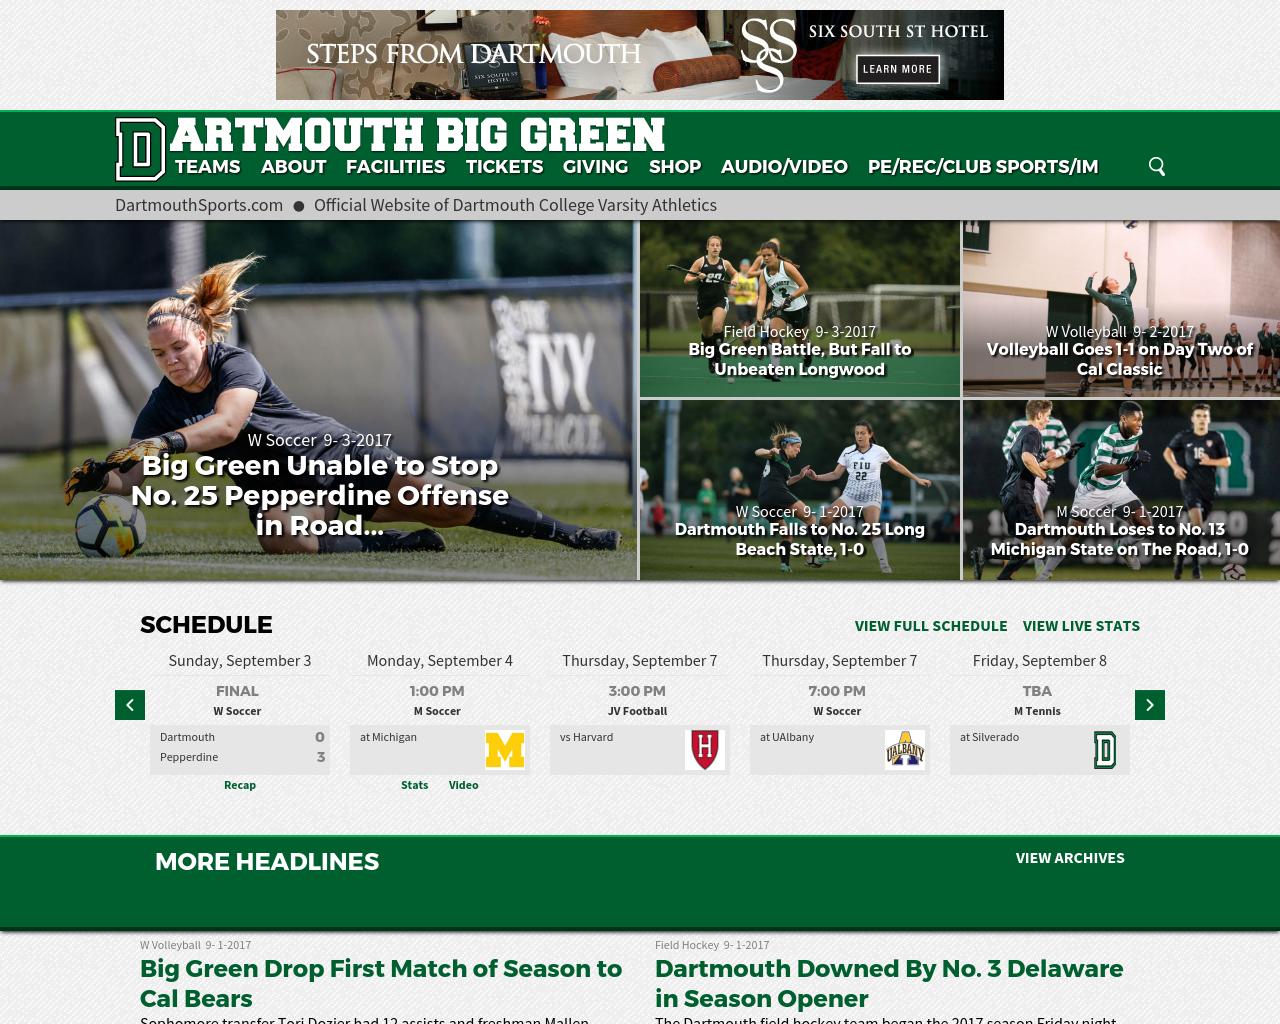 Dartmouth-Sports-Advertising-Reviews-Pricing